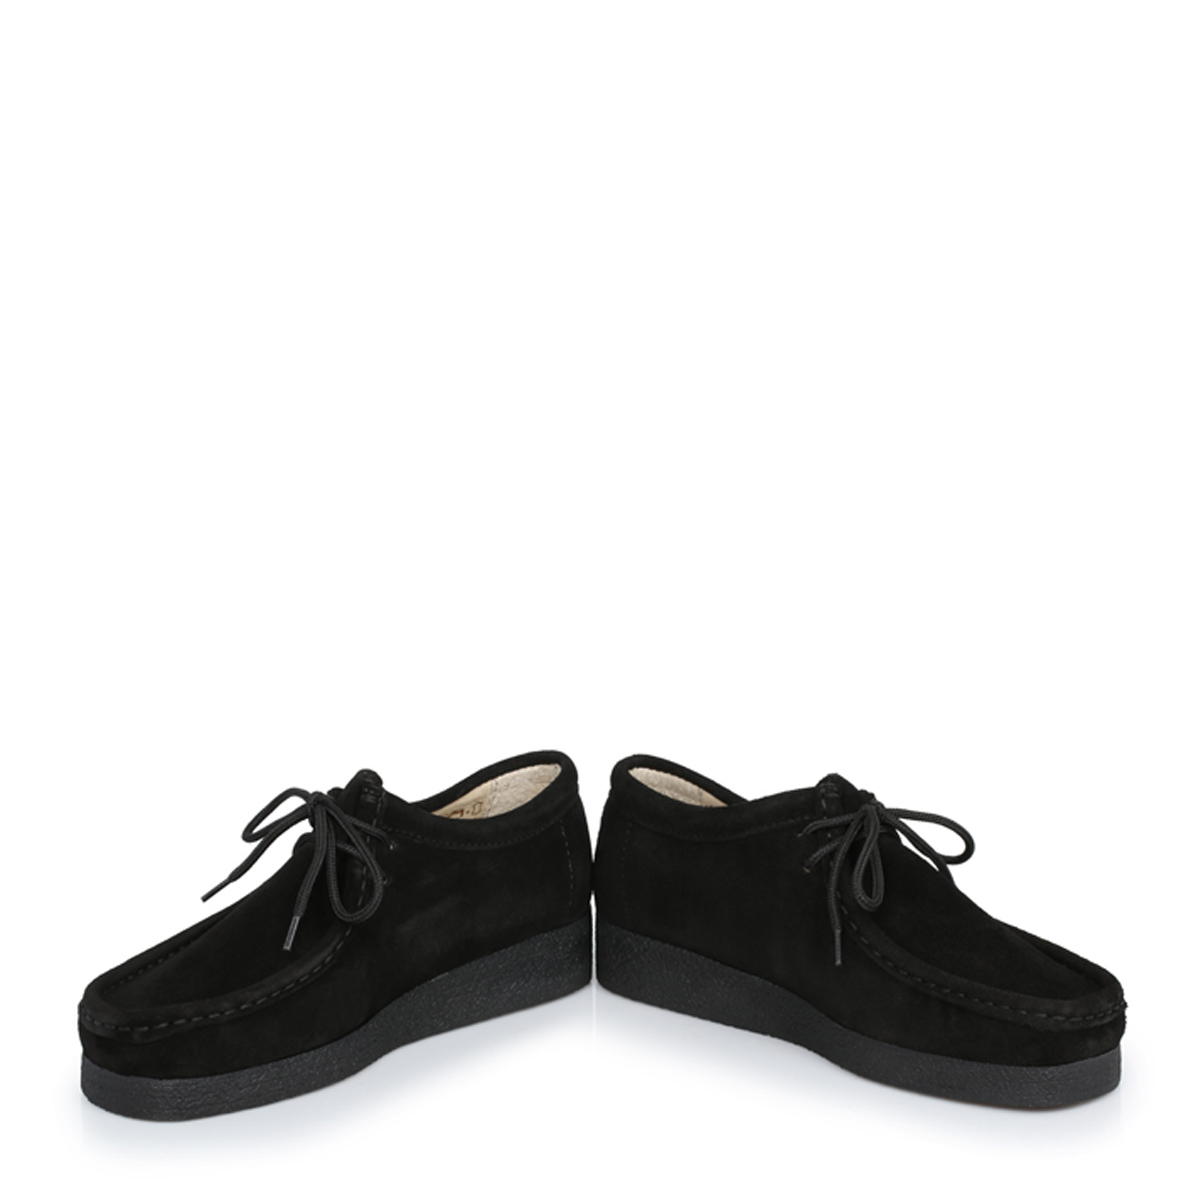 London Sole Shoes Uk